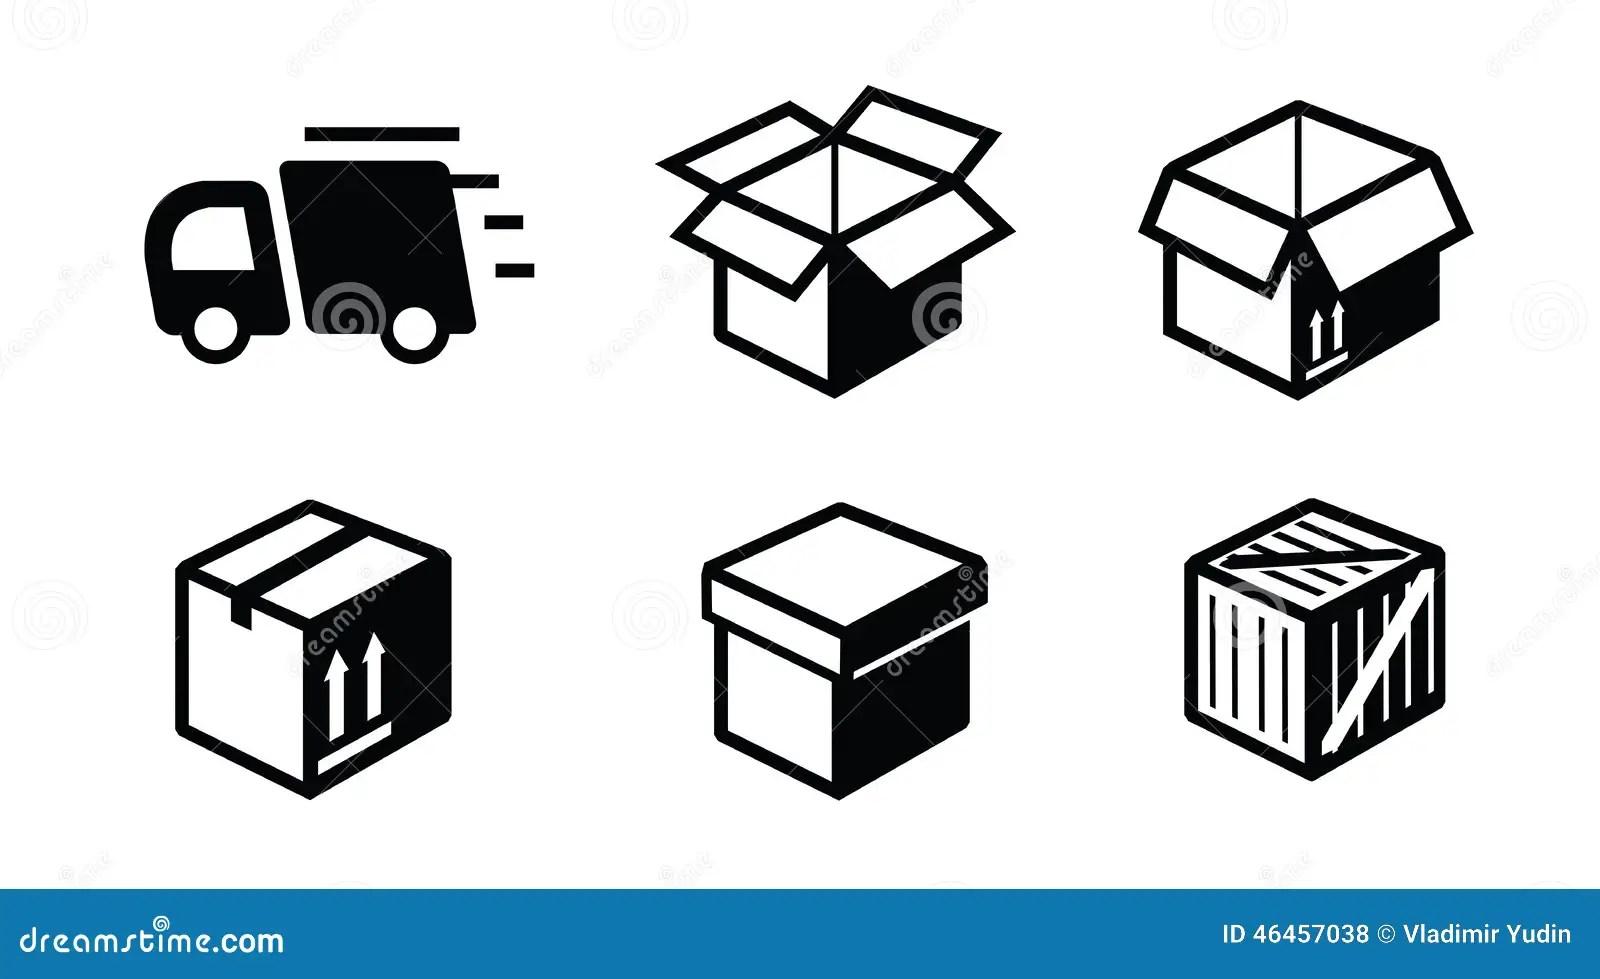 Shipping Icon Stock Vector Illustration Of Black